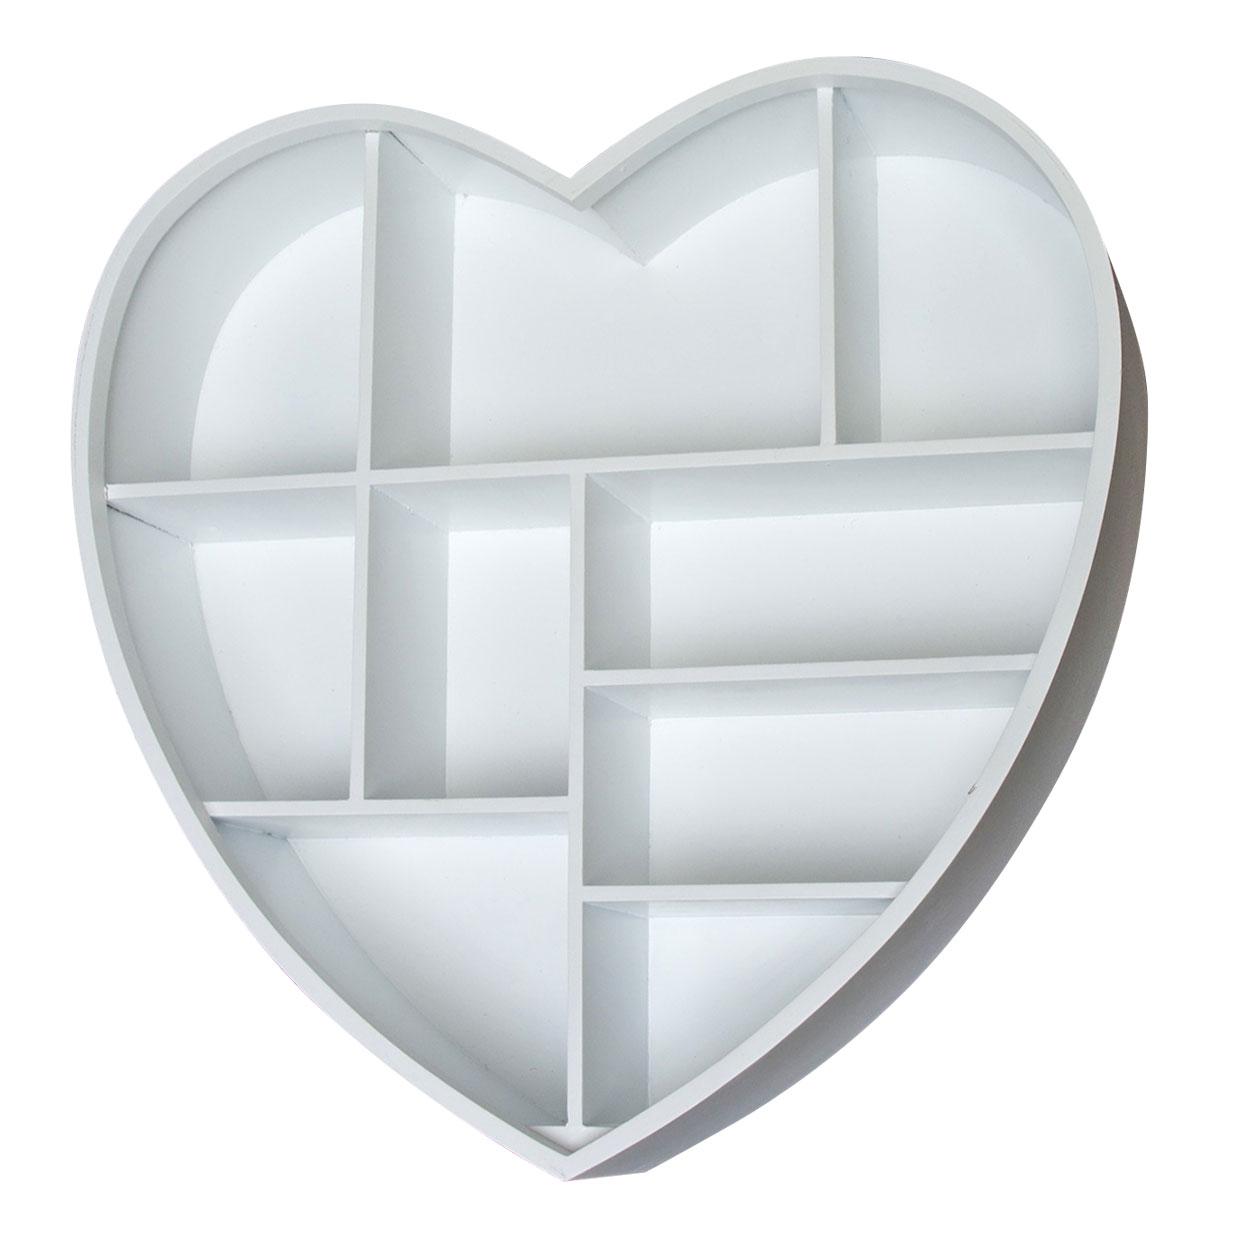 houten wandrek hart online kopen lobbesnl